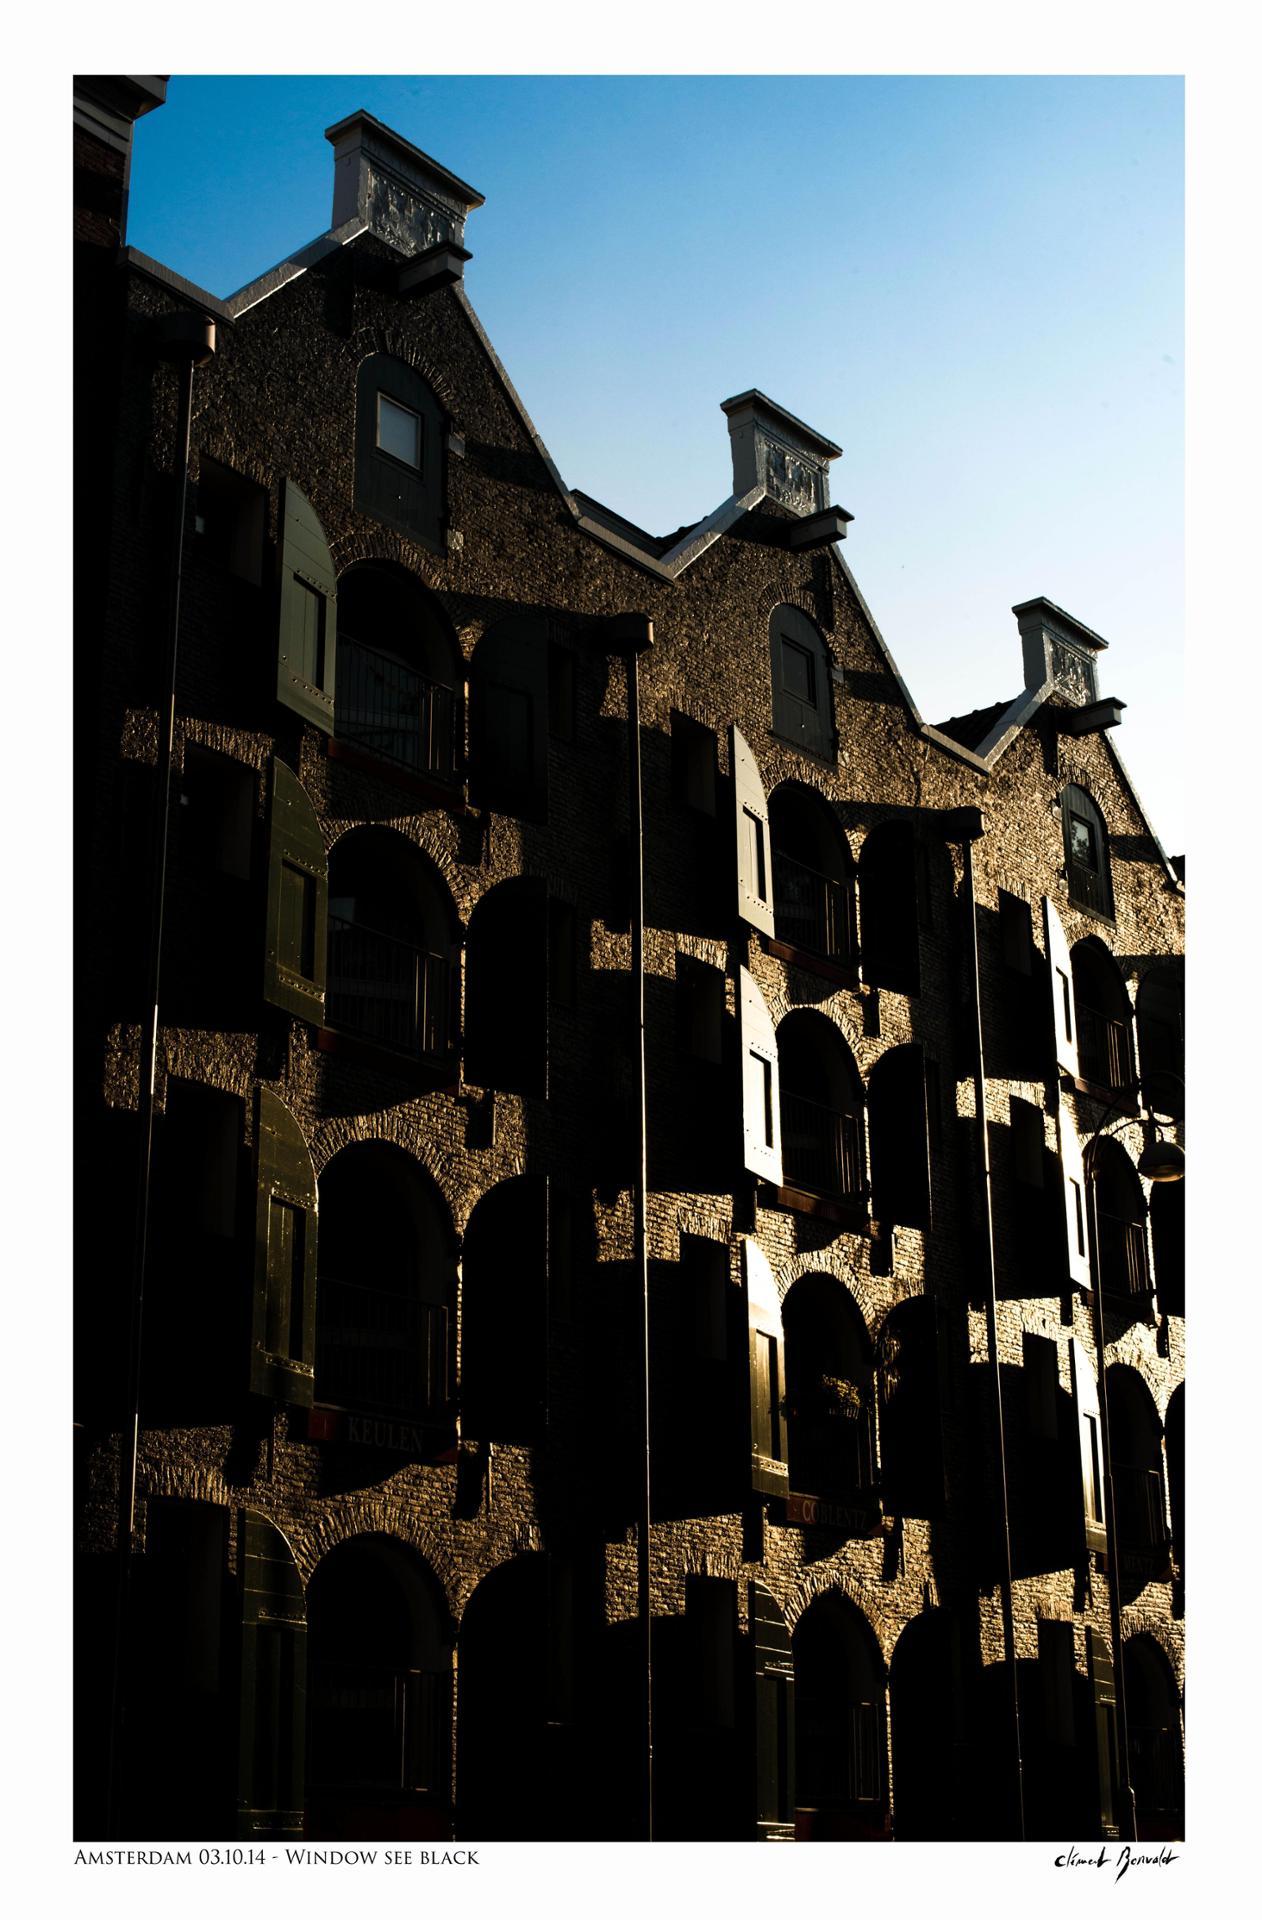 Amsterdam - Window see black © Clement Bonvalot copie.